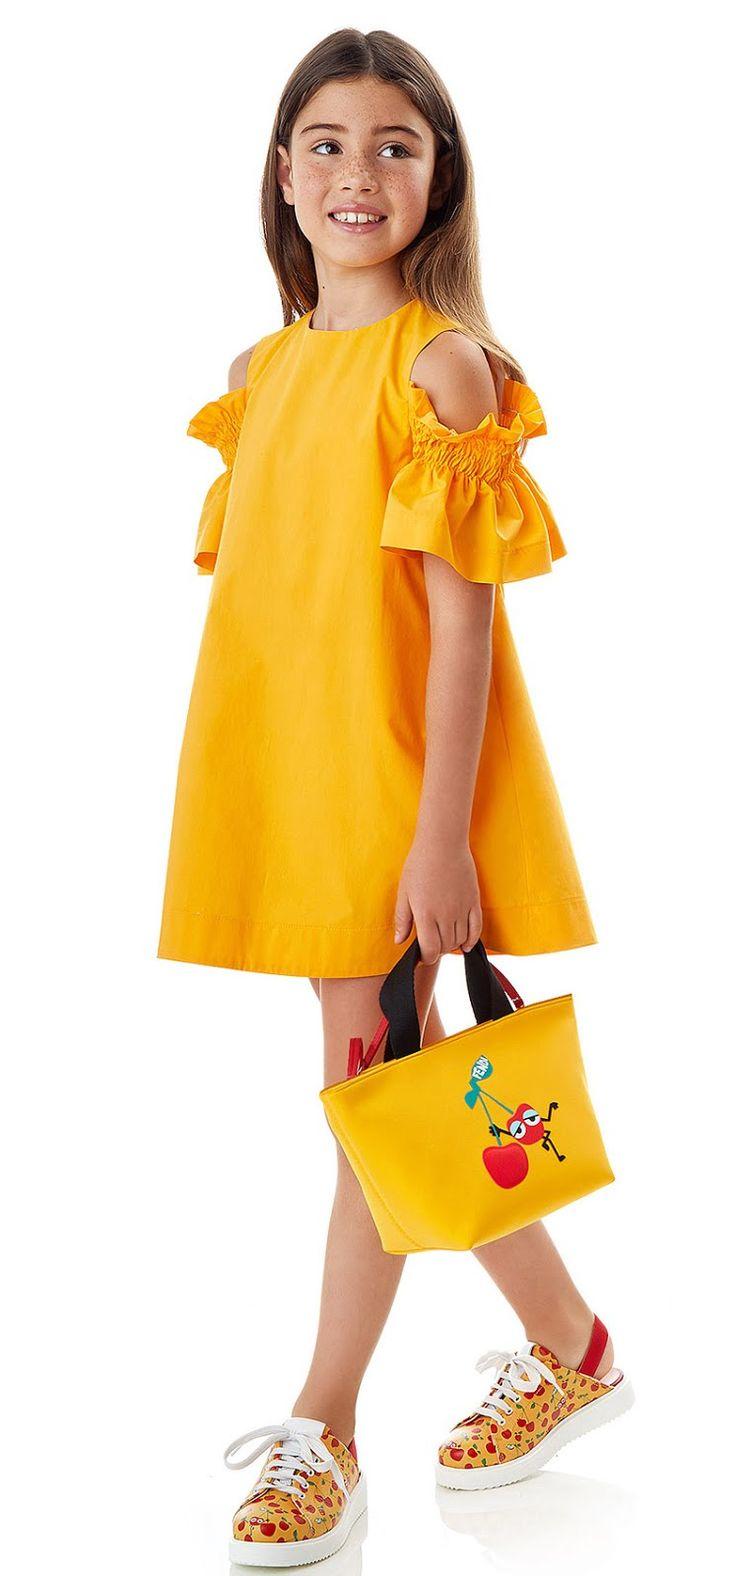 ALALOSHA: VOGUE ENFANTS: Must Have of the Day: FENDI Mini Shopping Bag